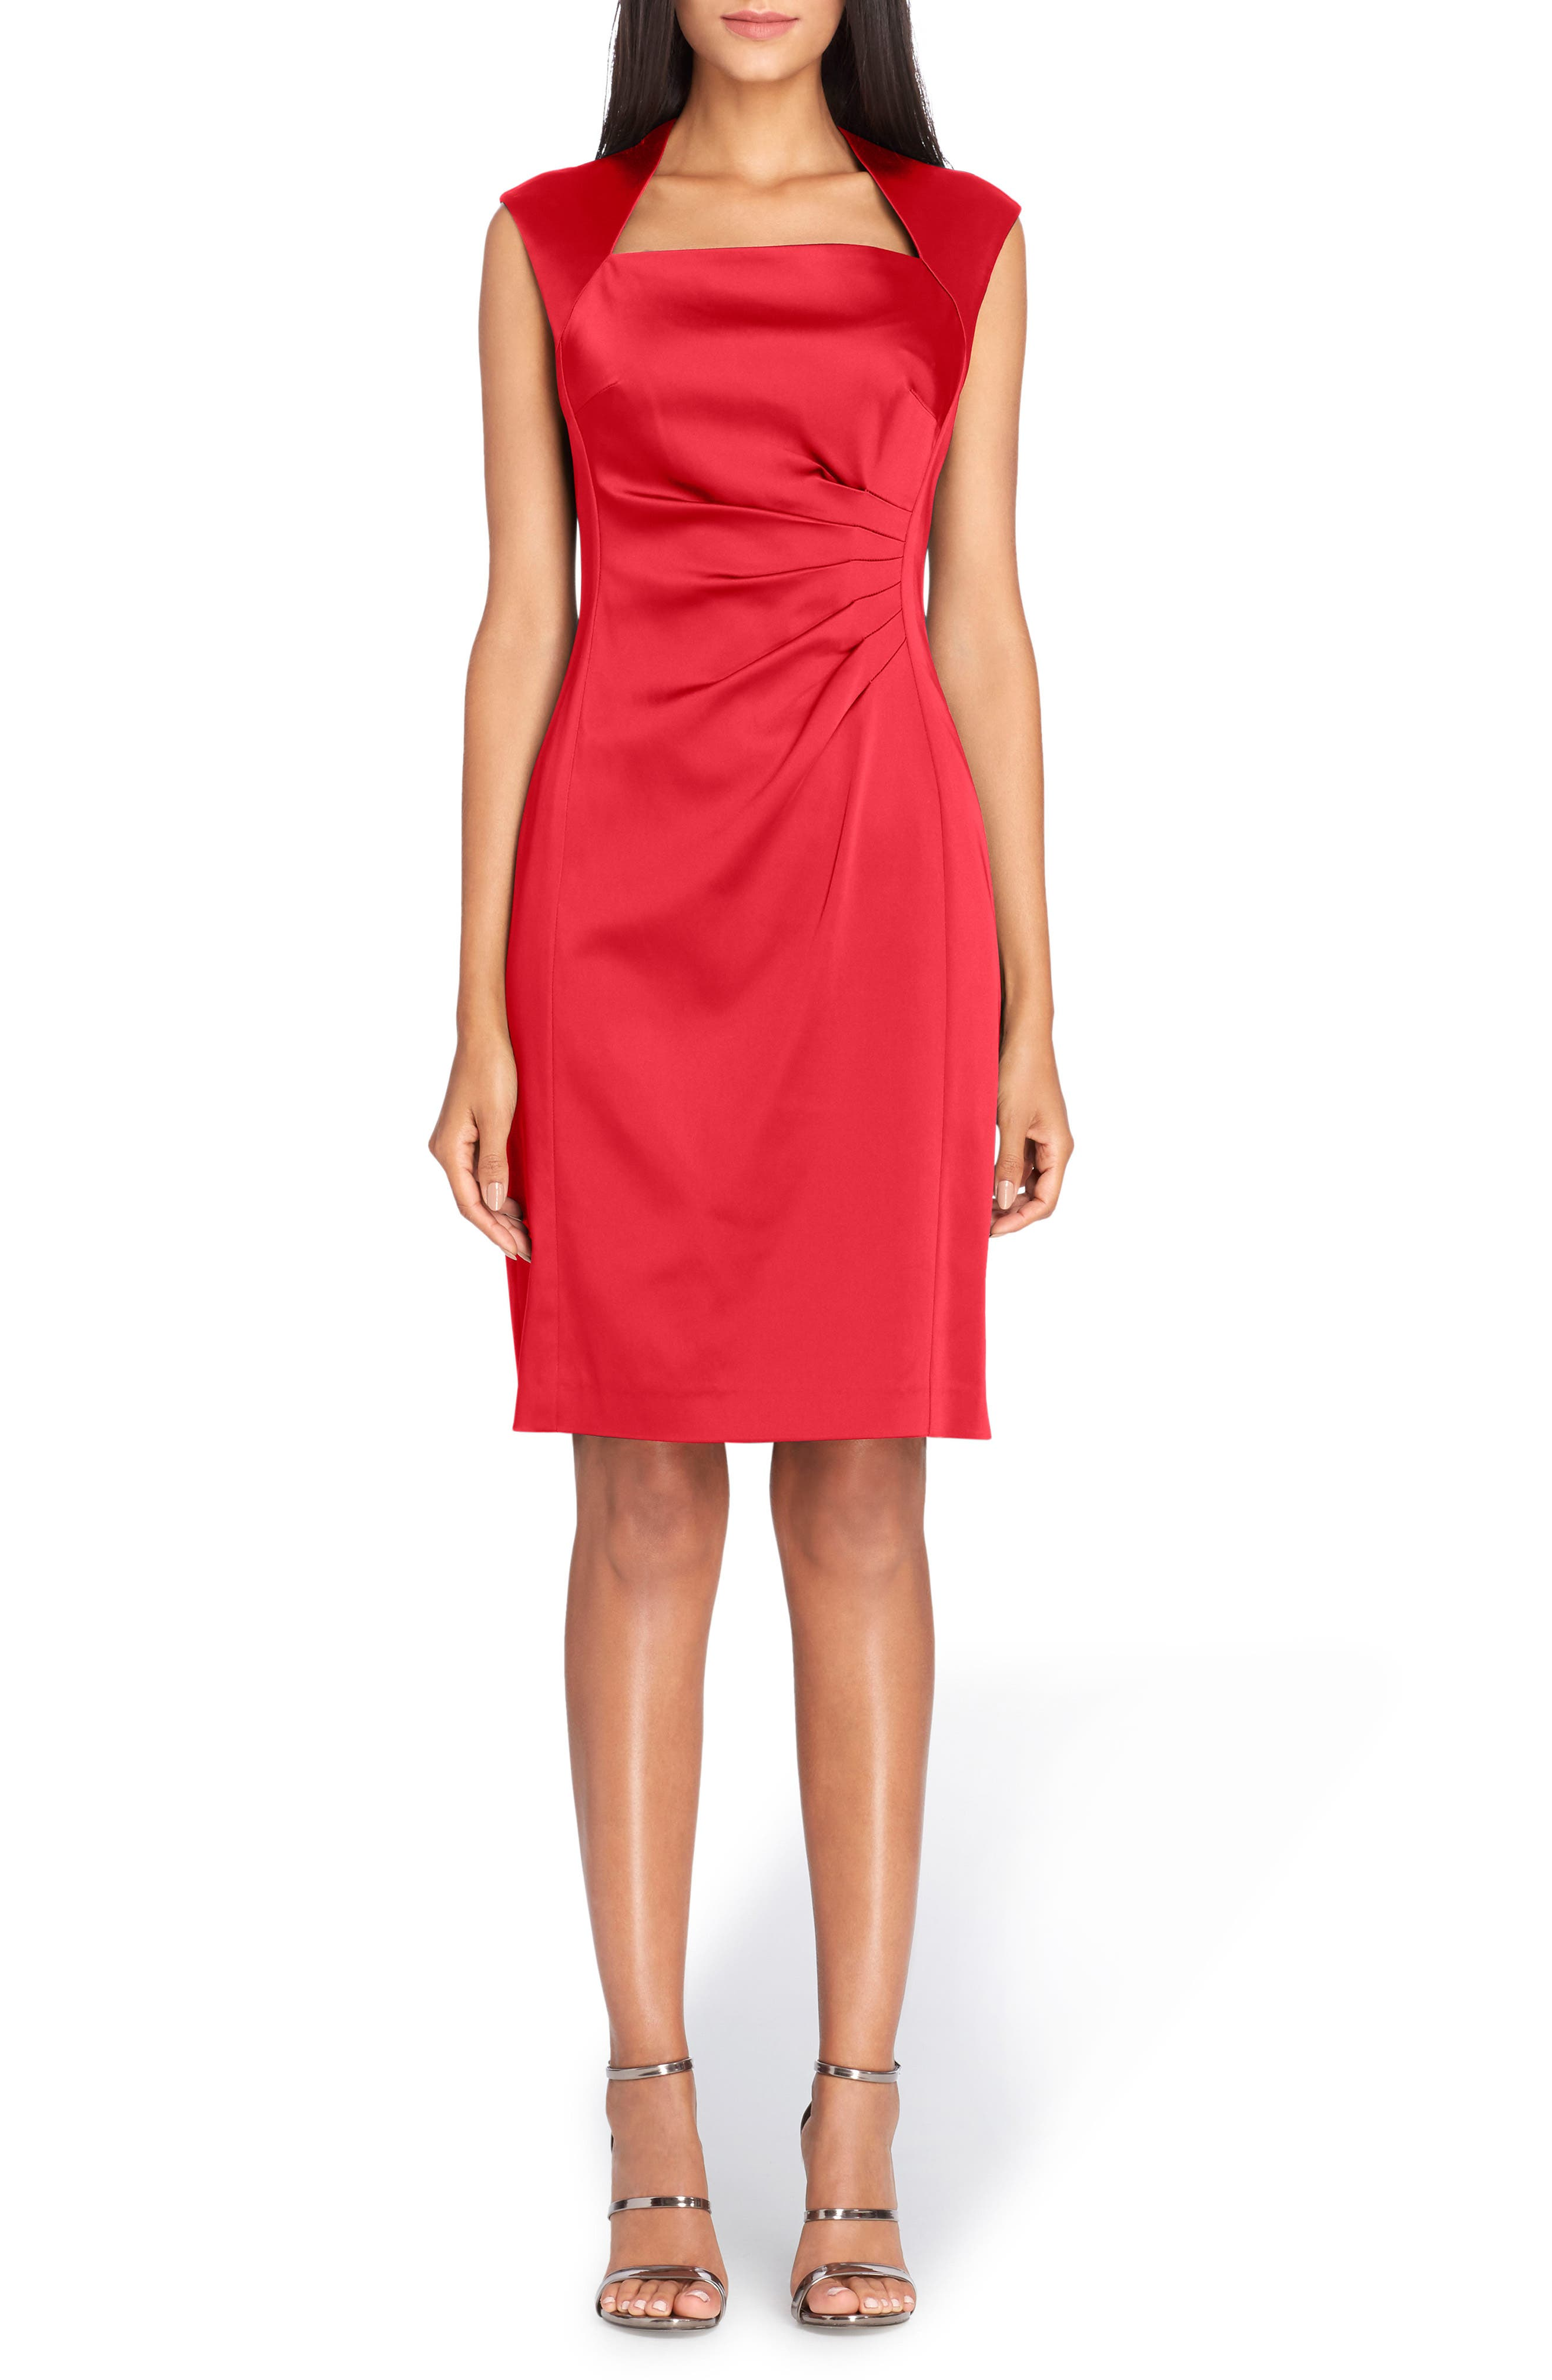 Alternate Image 1 Selected - Tahari Stretch Satin Sheath Dress (Regular & Petite)